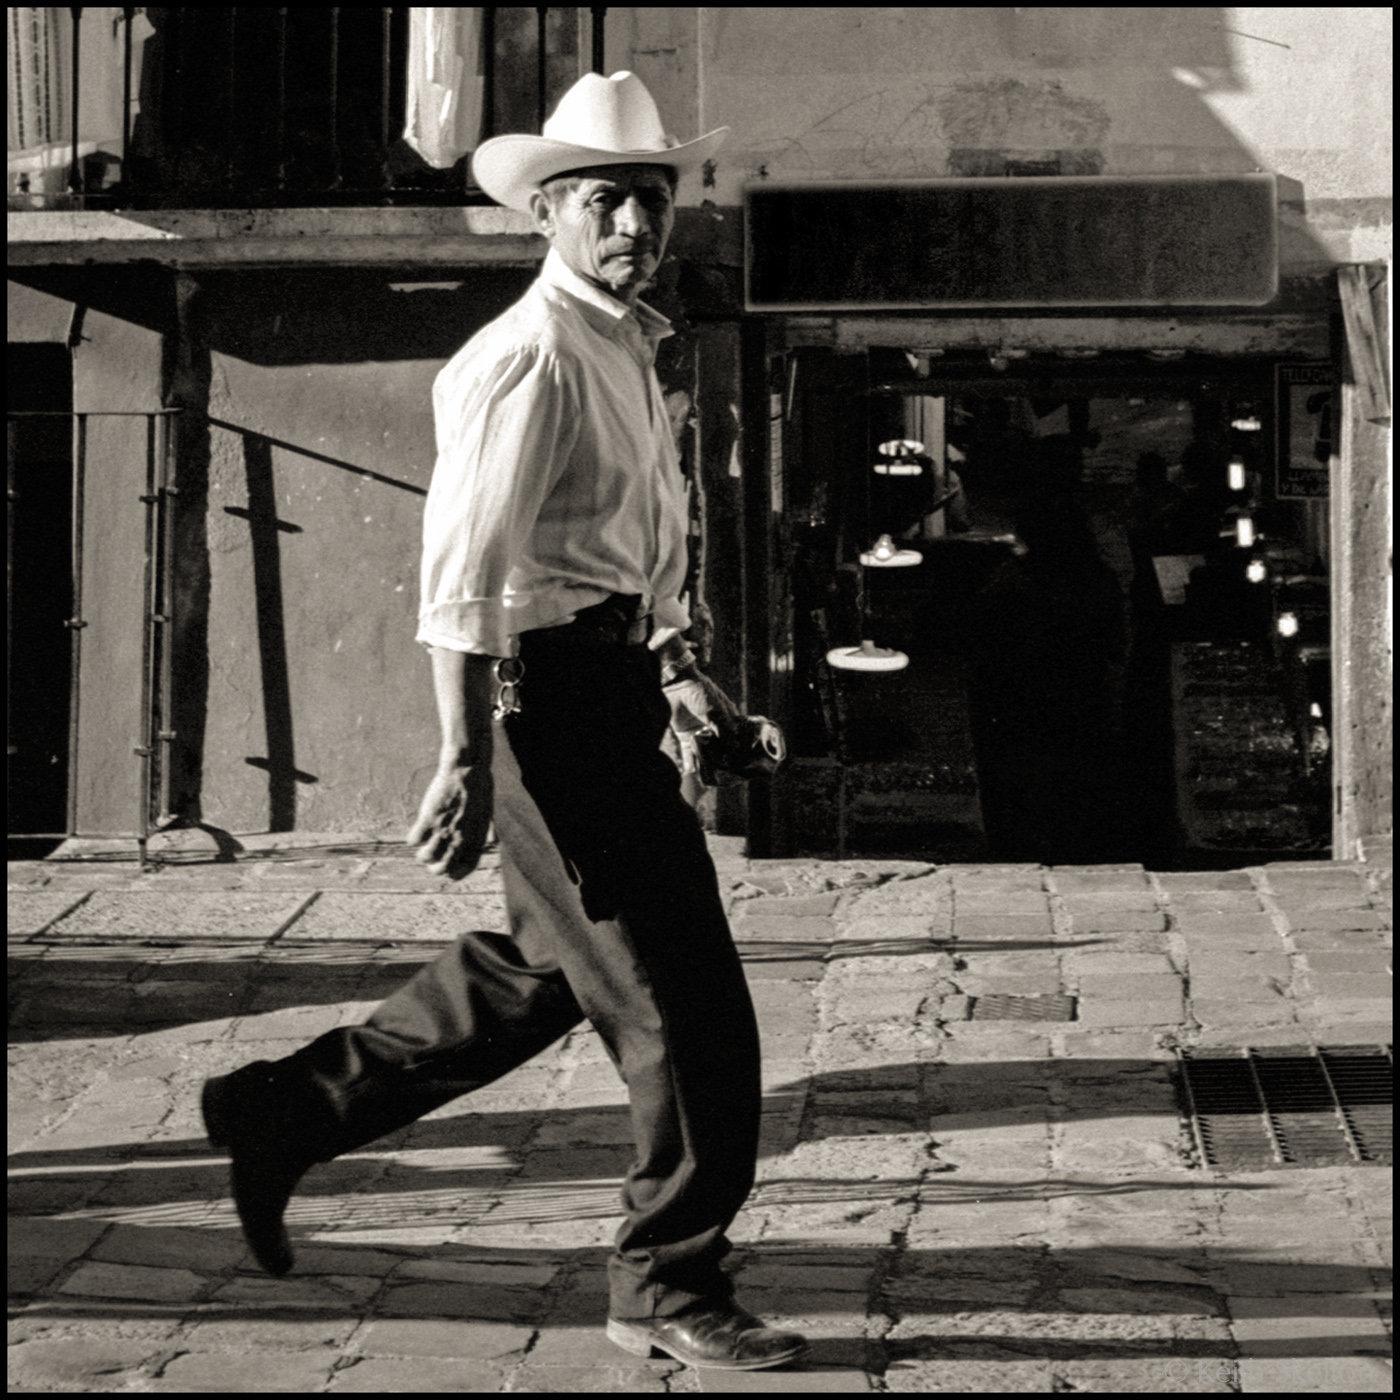 cowboy cropped-Edit.JPG